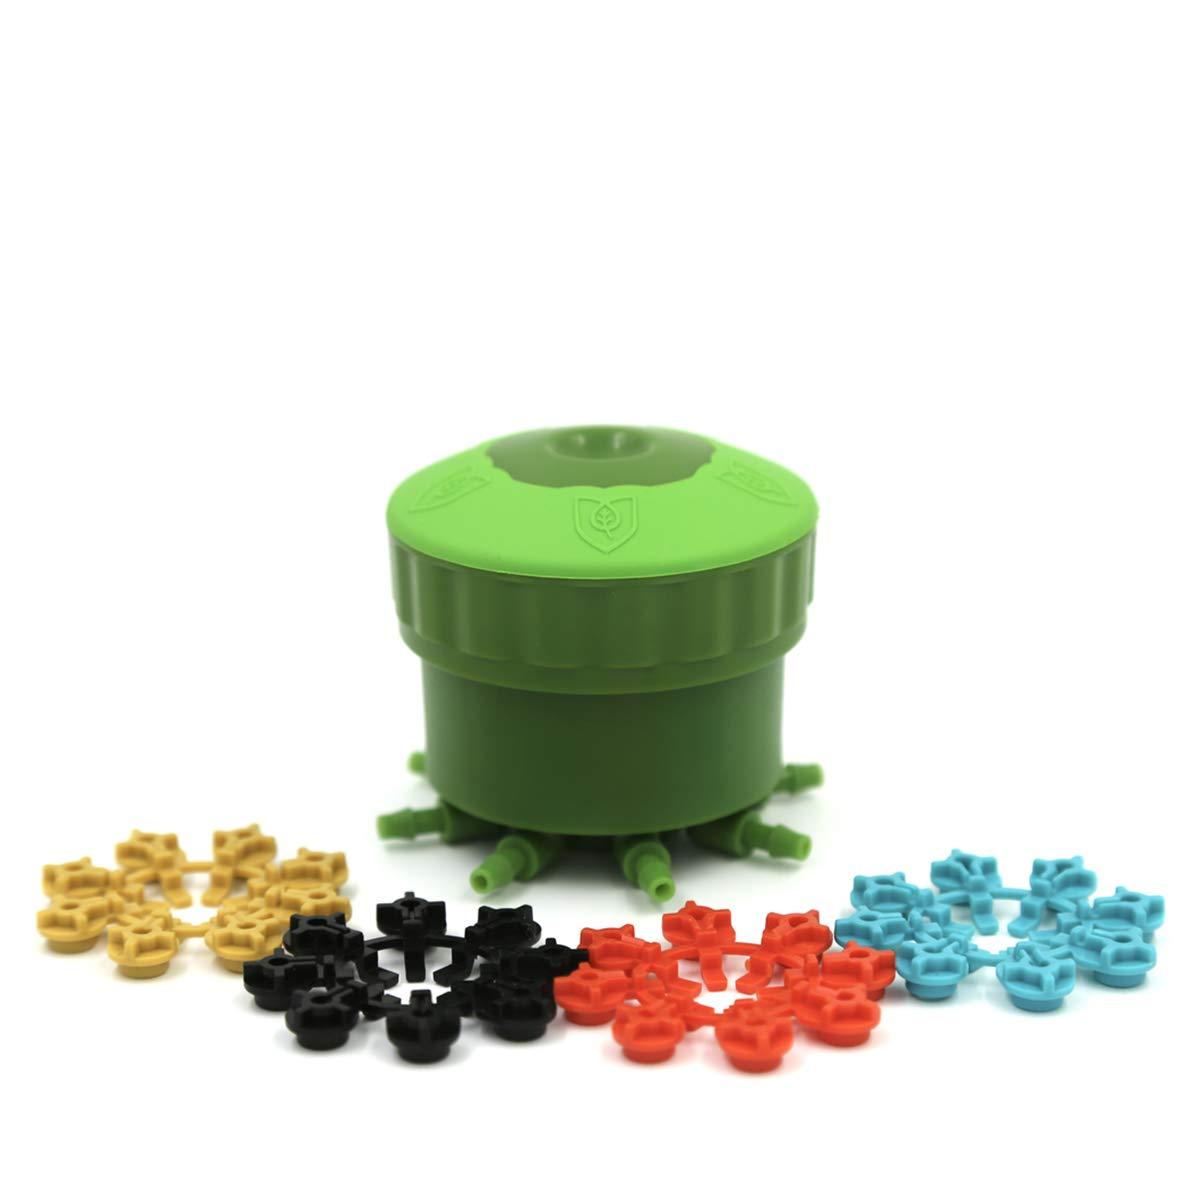 FloraFlex FFX159 Multi Flow Bubbler (1-Pack), Green